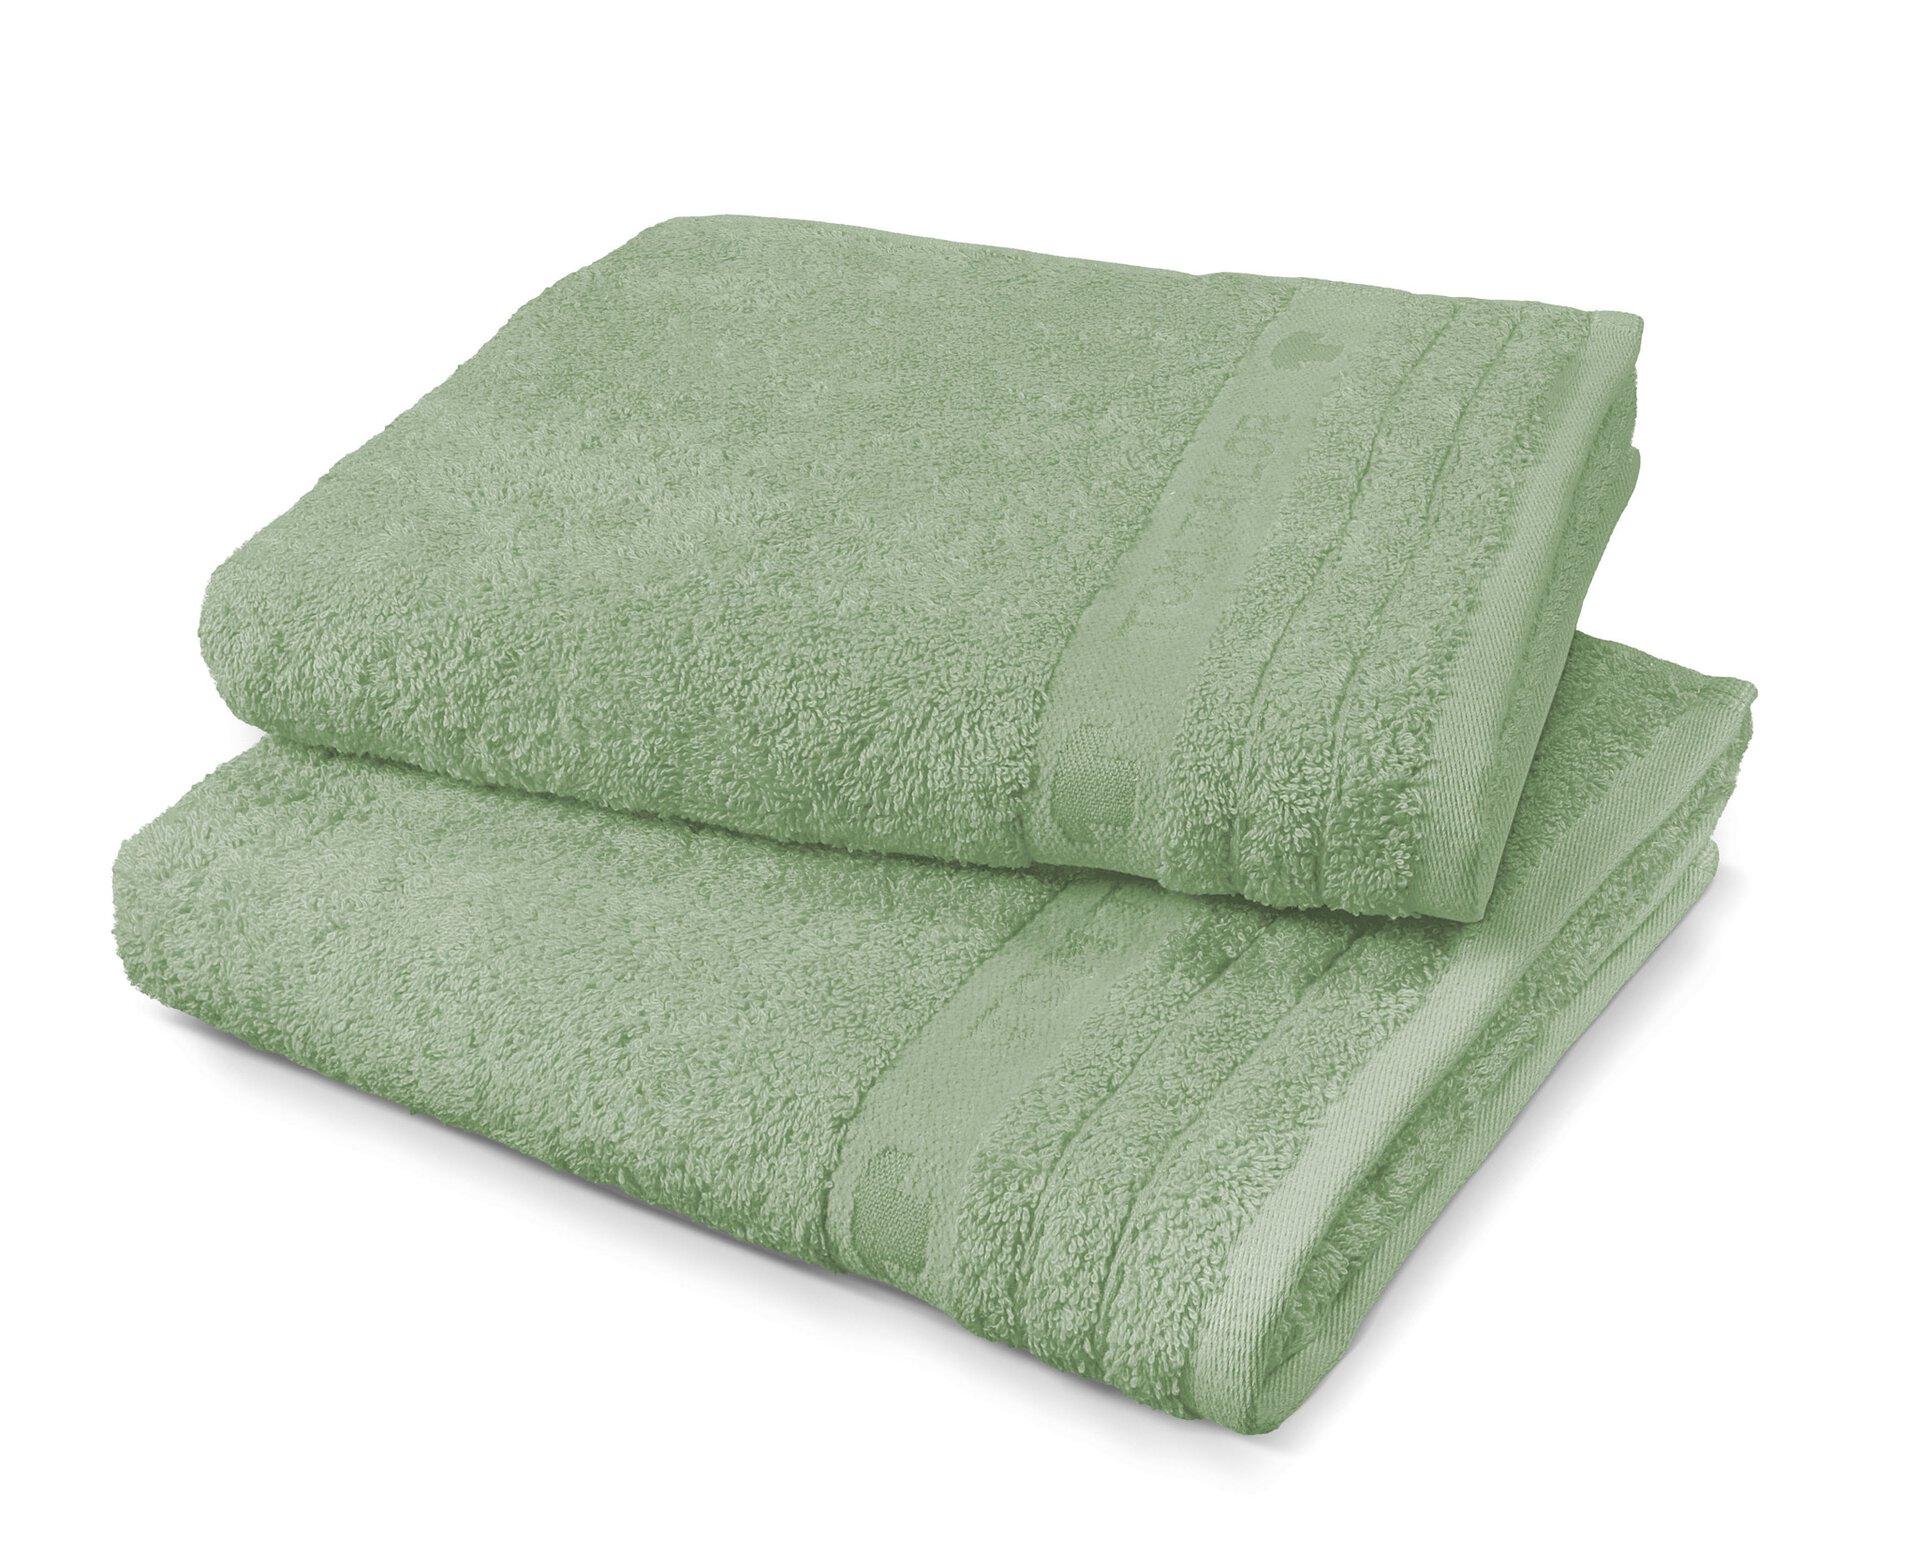 Badetuch Uni Towel Tom Tailor Textil grün 80 x 200 cm